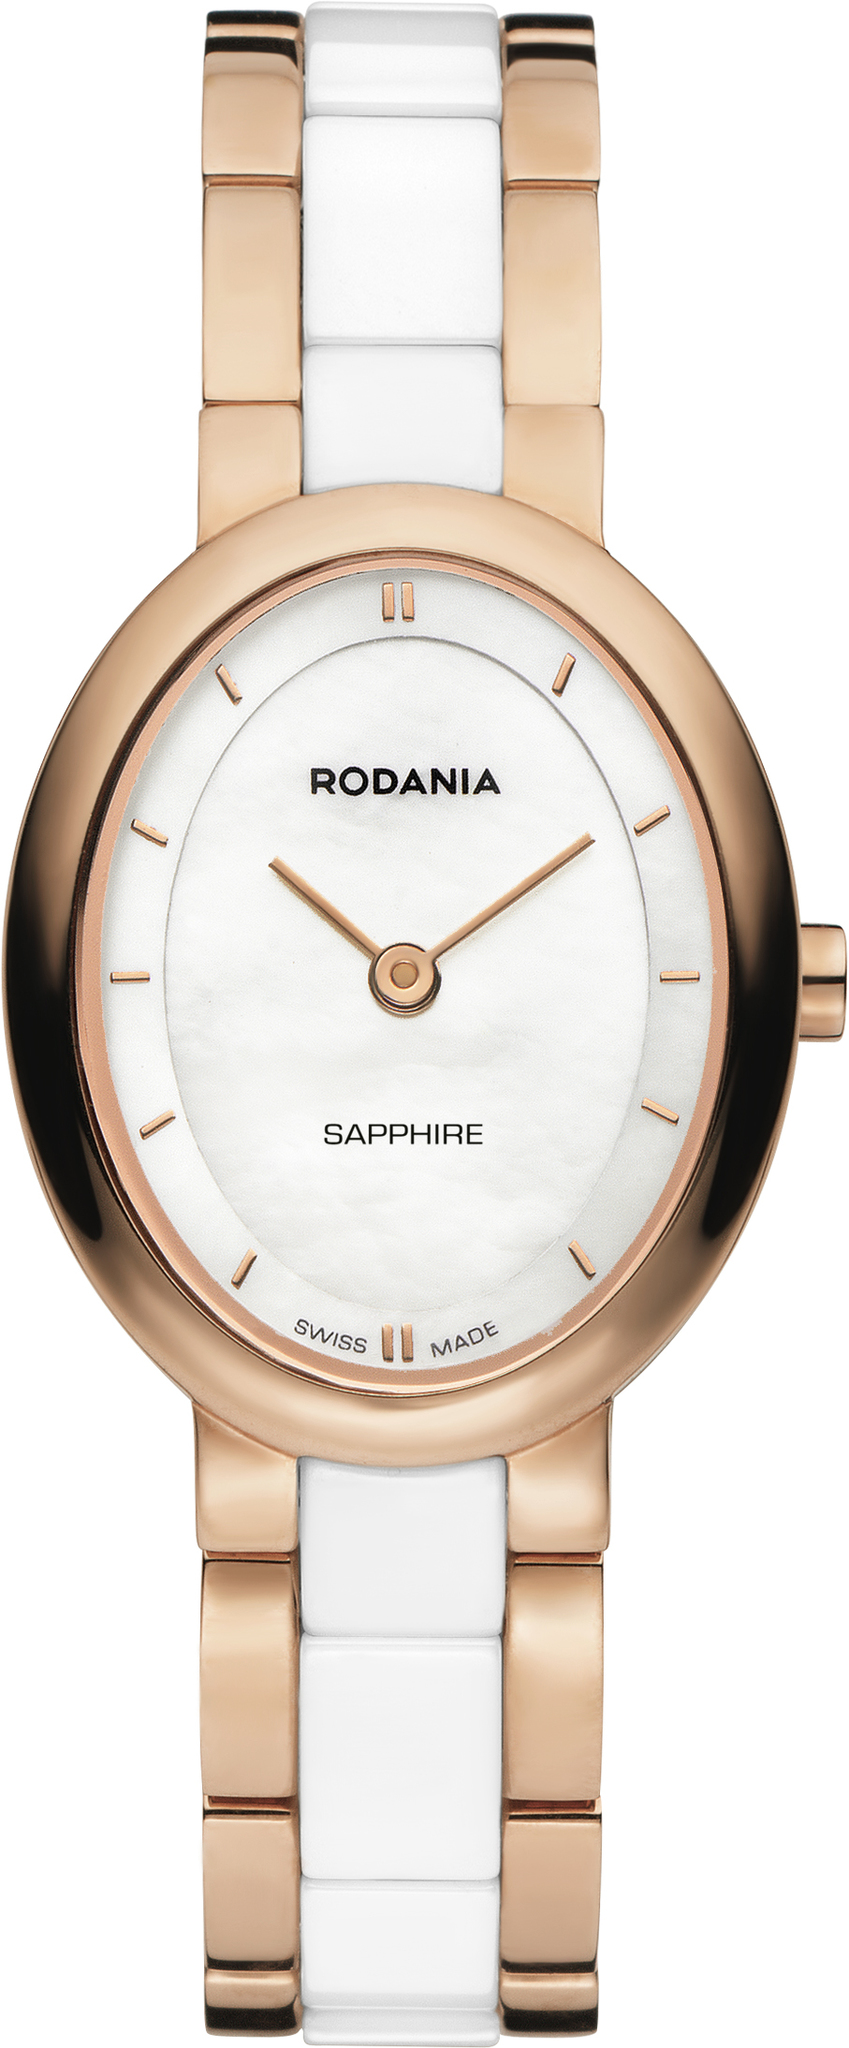 Rodania 25116.43 - женские наручные часы из коллекции FIRENZERodania<br><br><br>Бренд: Rodania<br>Модель: Rodania 25116.43<br>Артикул: 25116.43<br>Вариант артикула: None<br>Коллекция: FIRENZE<br>Подколлекция: None<br>Страна: Швейцария<br>Пол: женские<br>Тип механизма: кварцевые<br>Механизм: Ronda 762<br>Количество камней: None<br>Автоподзавод: None<br>Источник энергии: от батарейки<br>Срок службы элемента питания: None<br>Дисплей: стрелки<br>Цифры: отсутствуют<br>Водозащита: WR 50<br>Противоударные: None<br>Материал корпуса: нерж. сталь, IP покрытие: позолота (полное)<br>Материал браслета: нерж. сталь + керамика, IP покрытие (частичное): позолота<br>Материал безеля: None<br>Стекло: сапфировое<br>Антибликовое покрытие: None<br>Цвет корпуса: None<br>Цвет браслета: None<br>Цвет циферблата: None<br>Цвет безеля: None<br>Размеры: 23.5x34 мм<br>Диаметр: None<br>Диаметр корпуса: None<br>Толщина: None<br>Ширина ремешка: None<br>Вес: None<br>Спорт-функции: None<br>Подсветка: None<br>Вставка: None<br>Отображение даты: None<br>Хронограф: None<br>Таймер: None<br>Термометр: None<br>Хронометр: None<br>GPS: None<br>Радиосинхронизация: None<br>Барометр: None<br>Скелетон: None<br>Дополнительная информация: None<br>Дополнительные функции: None